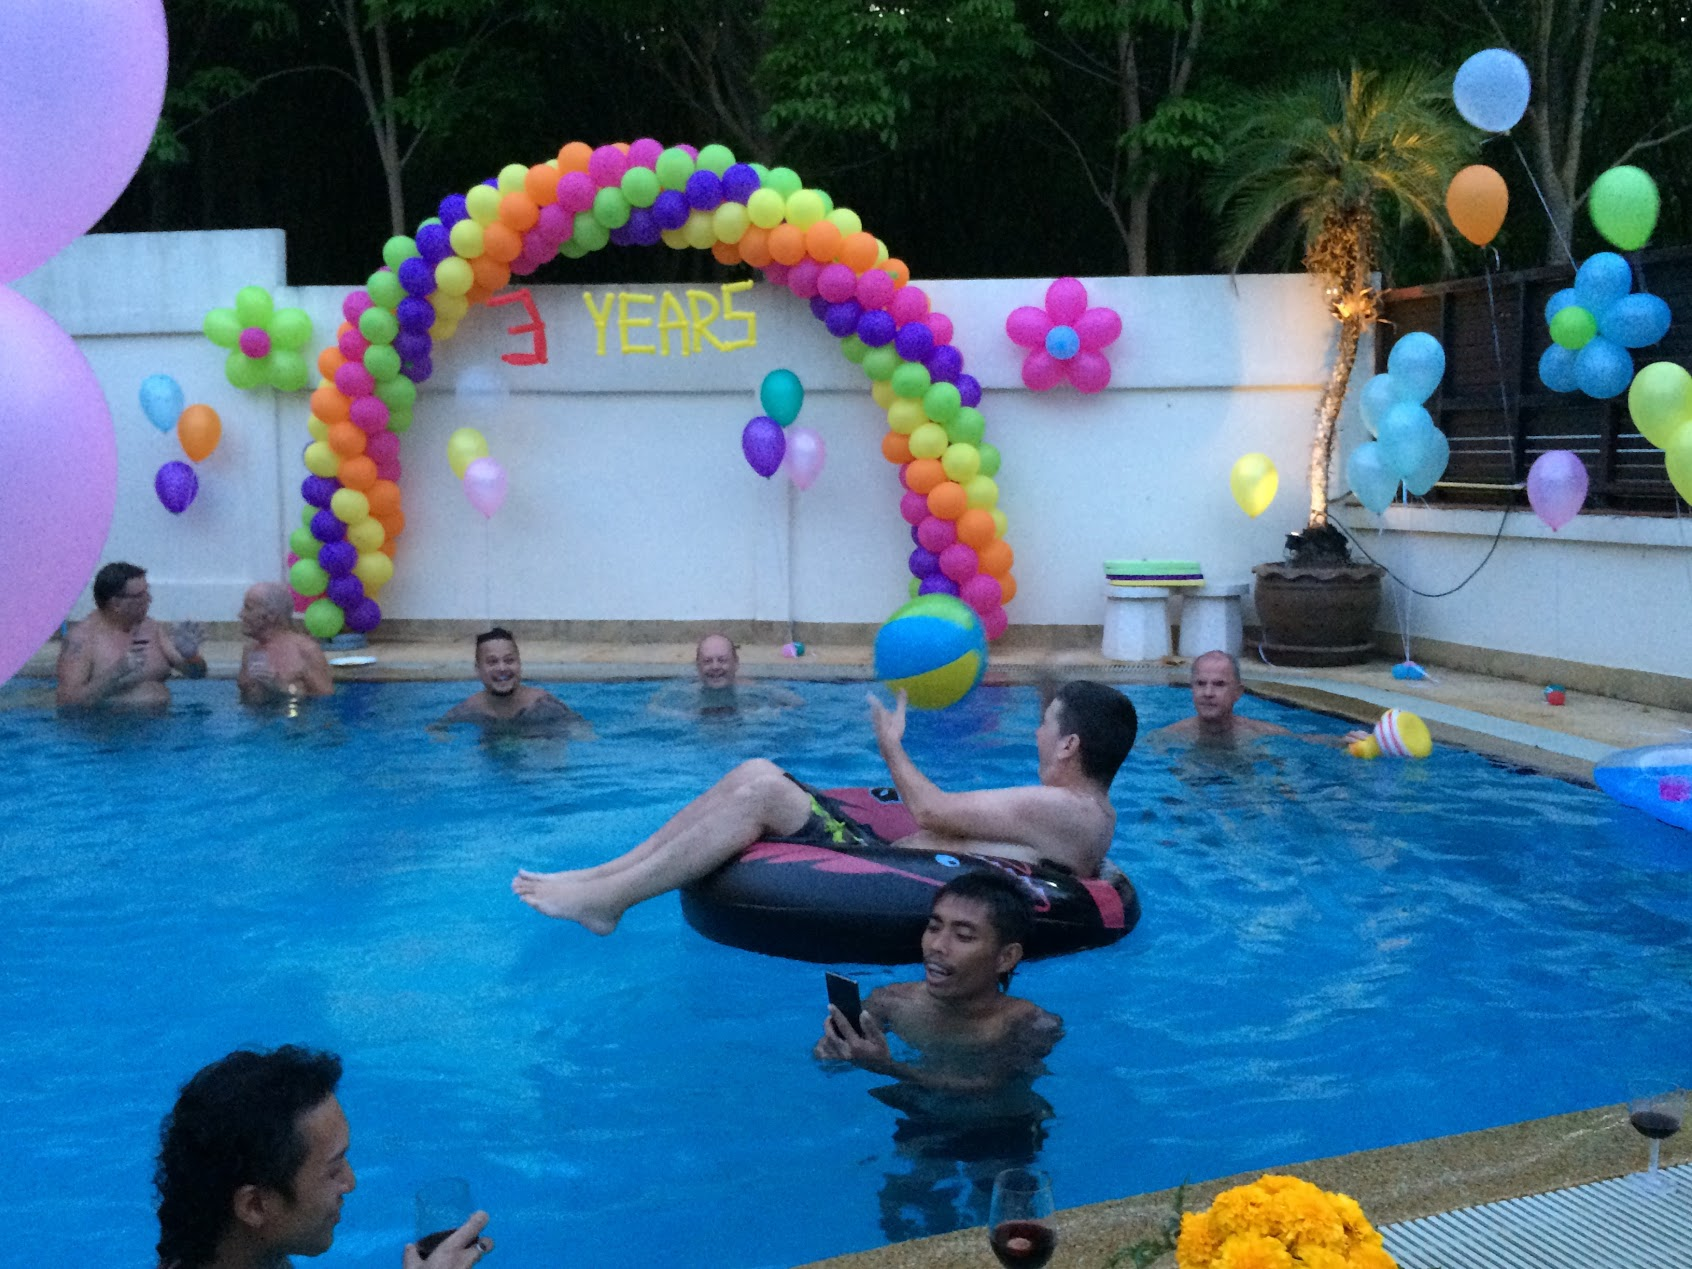 phuket gay dating